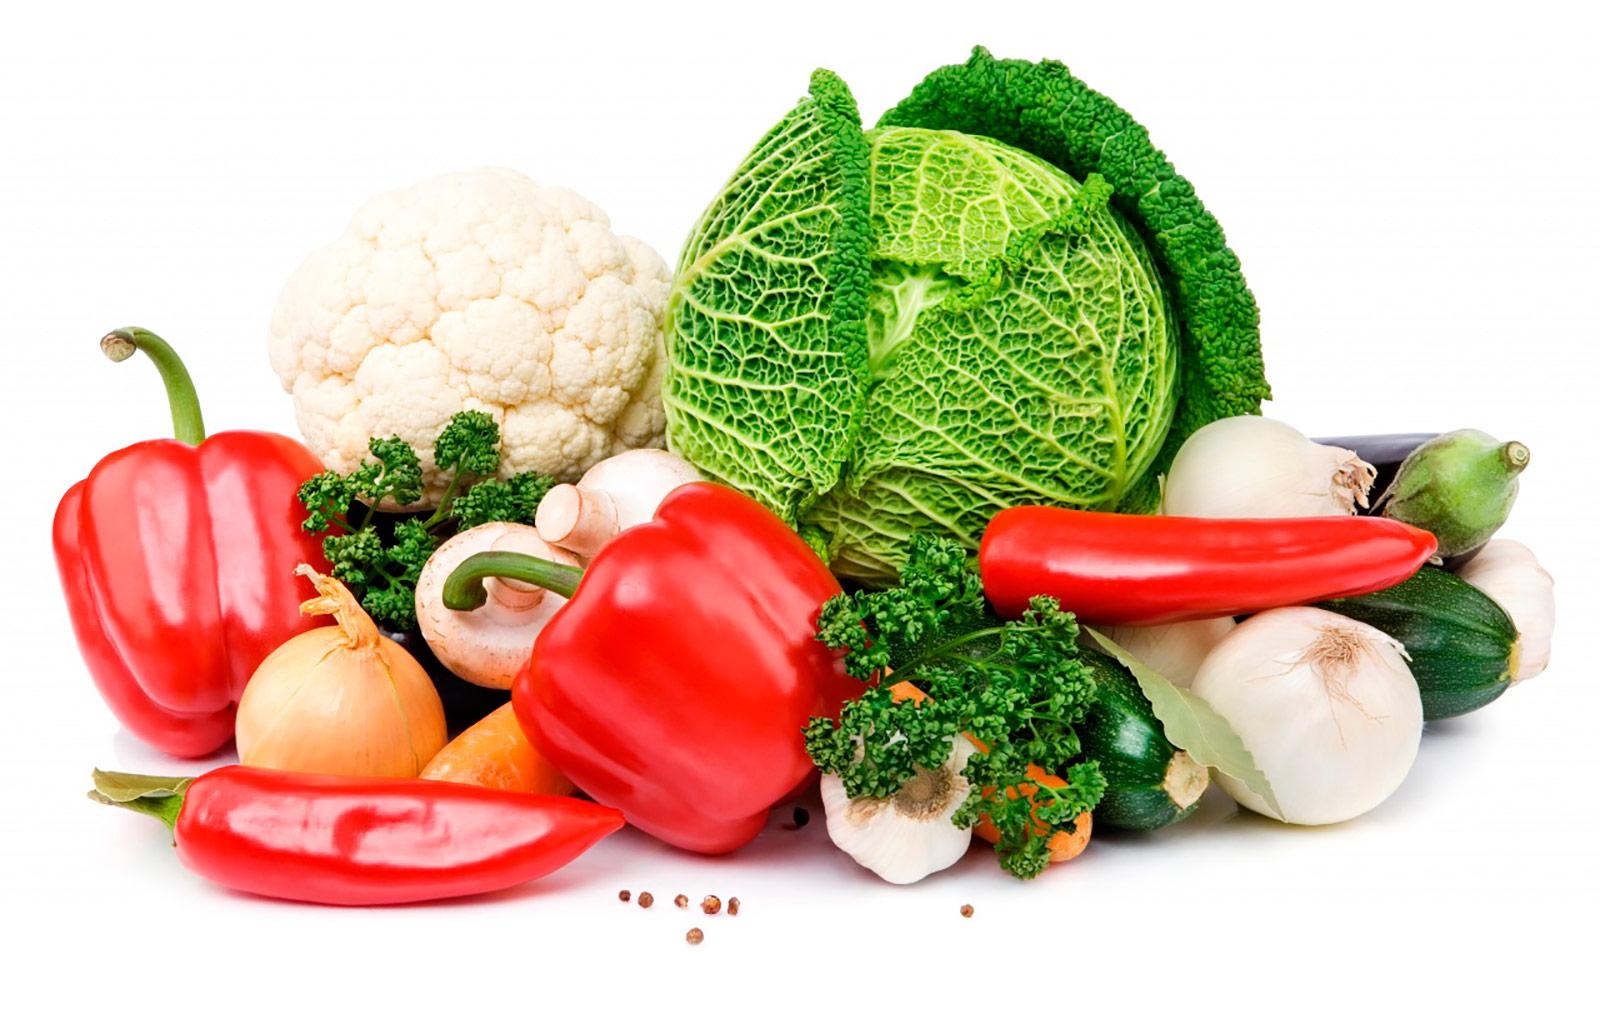 Alimentos procesados, frescos, verduras, frutas. Recomendación médica. Chat médico. Sònia Cibrián. Mediquo. Tu amigo médico. Chat médico.